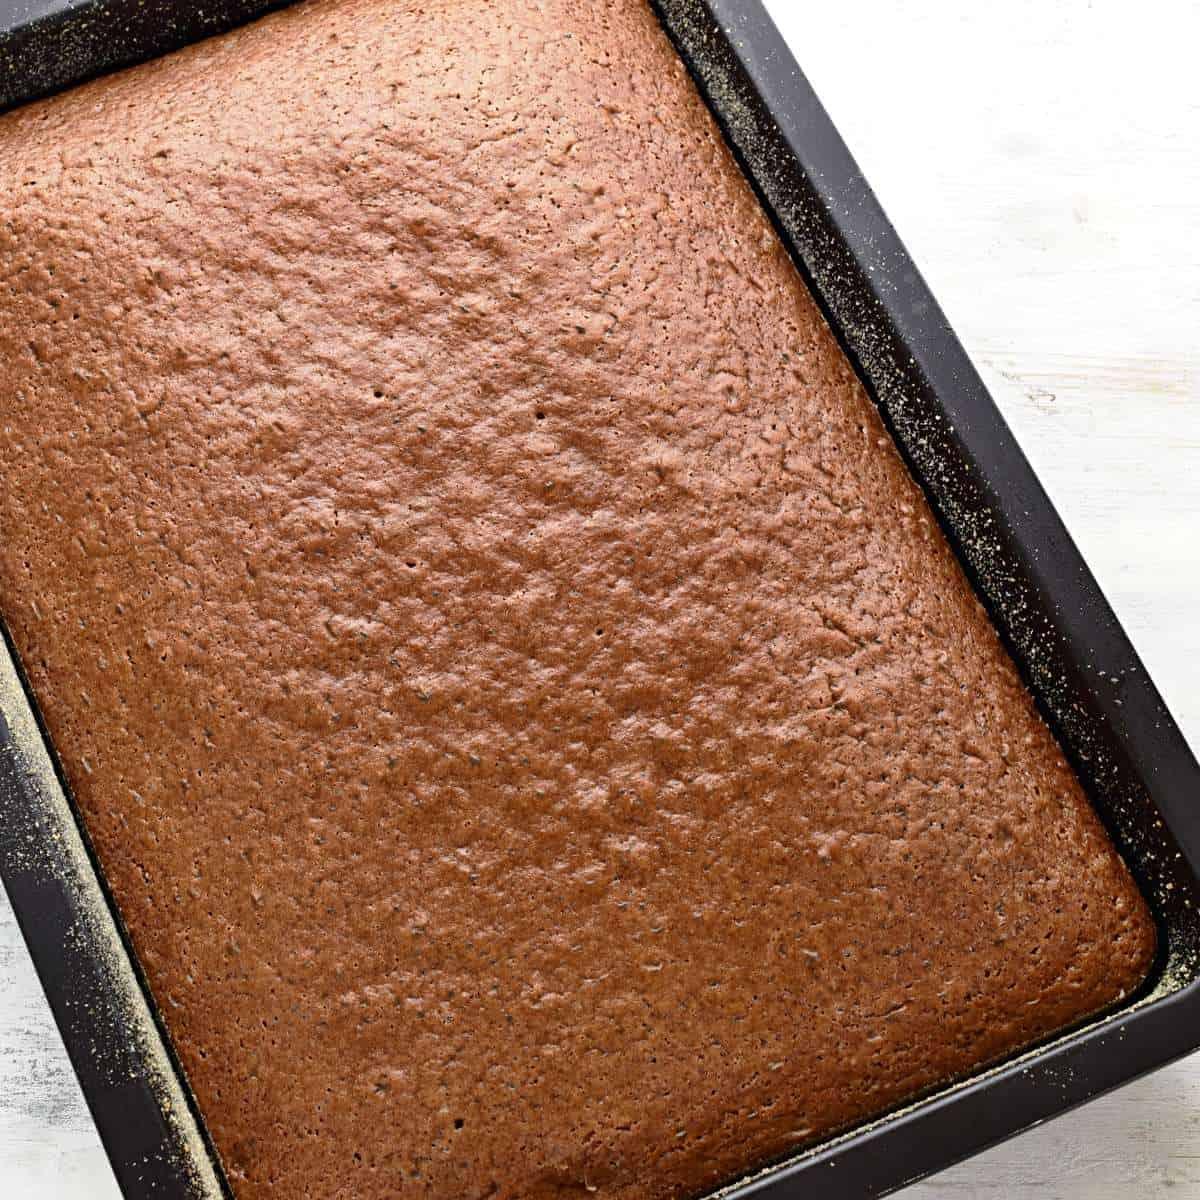 Buttermilk cake baked.